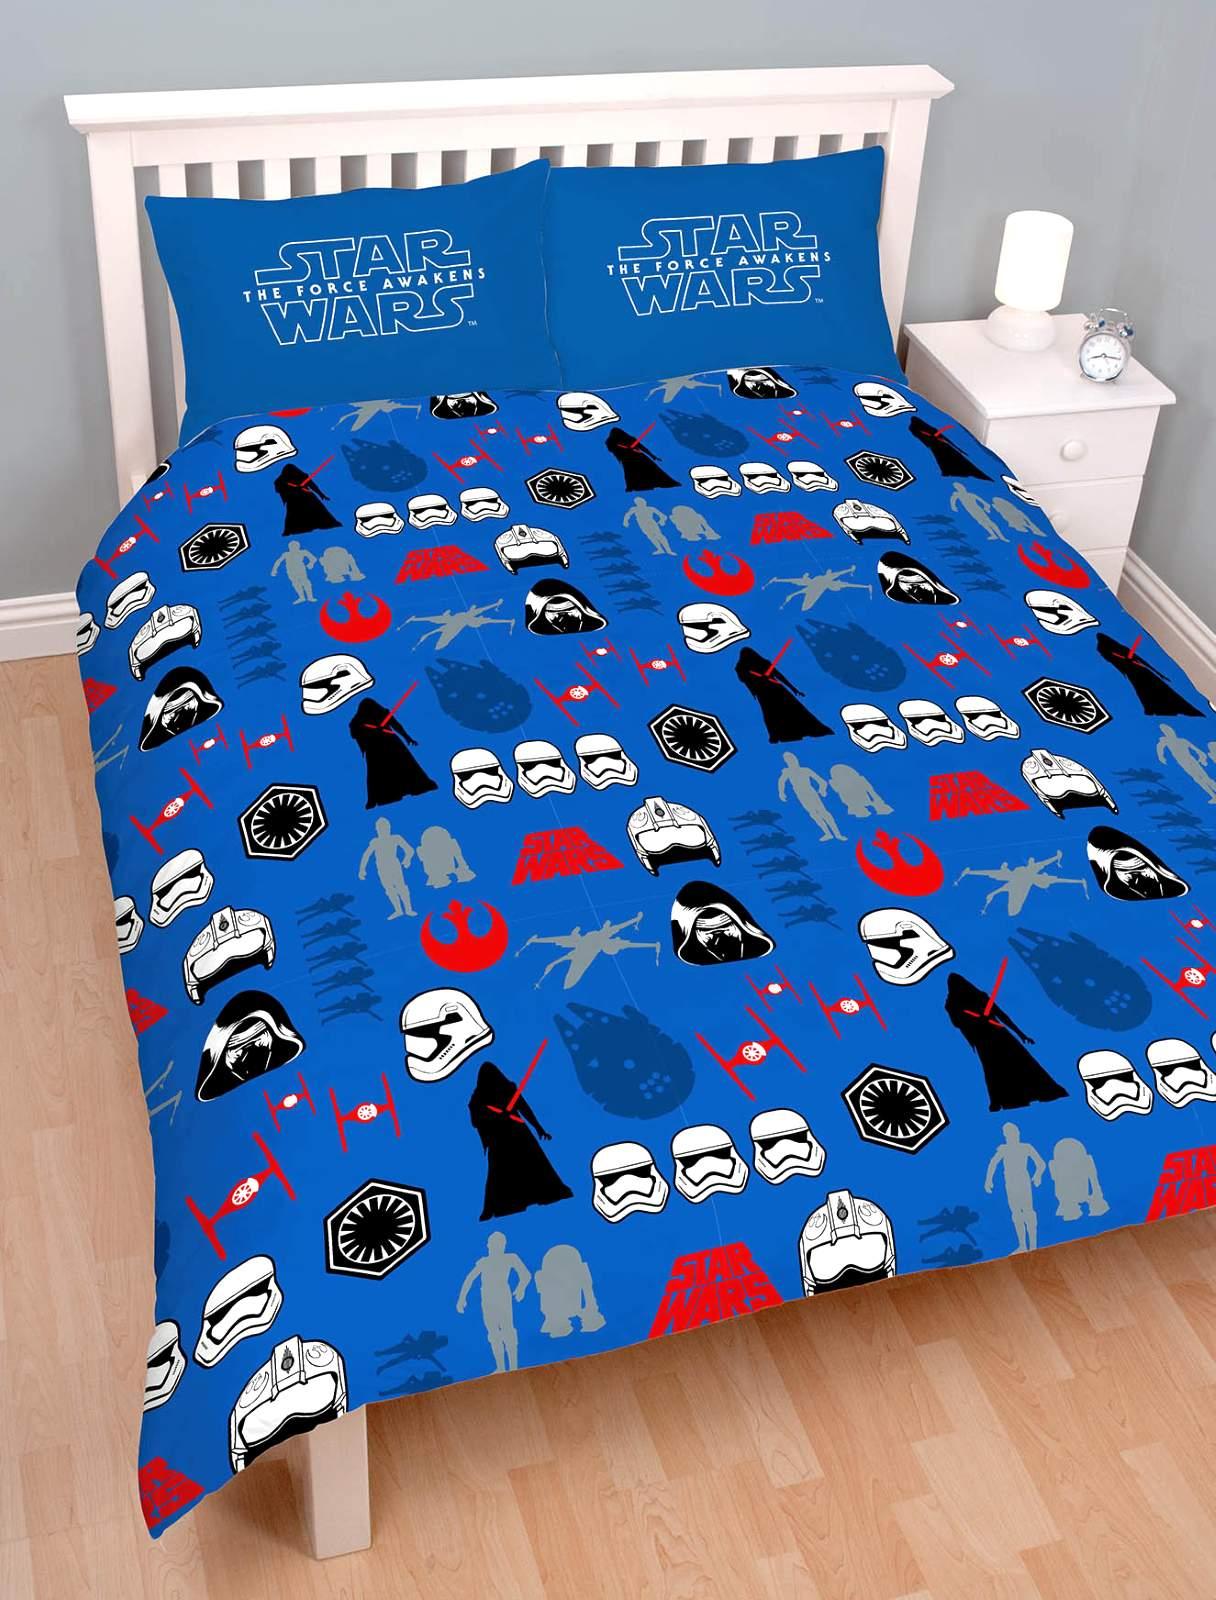 star wars diviseur set couvre lit double la force awakensboys chambre d 39 enfant ebay. Black Bedroom Furniture Sets. Home Design Ideas